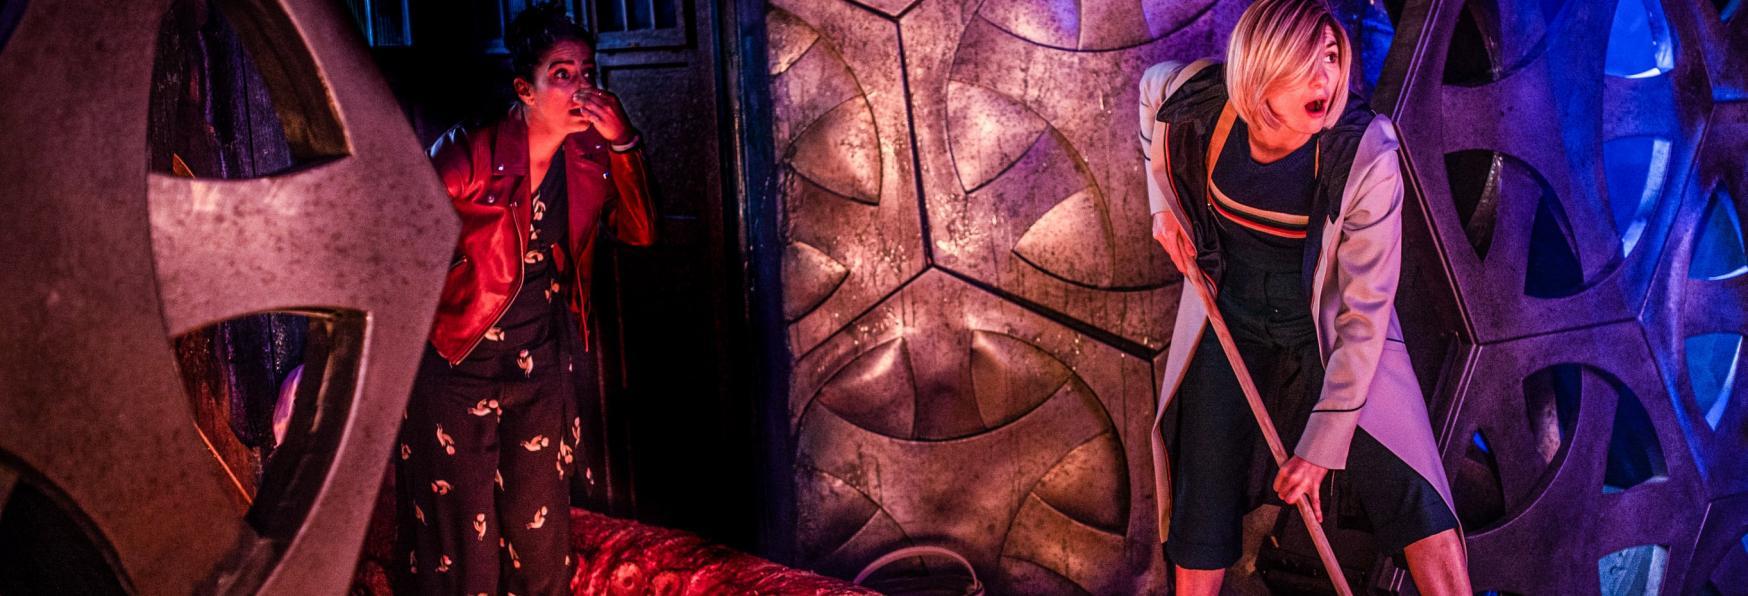 Doctor Who: Recensione del Deludente Episodio 12x03 (Orphan 55)